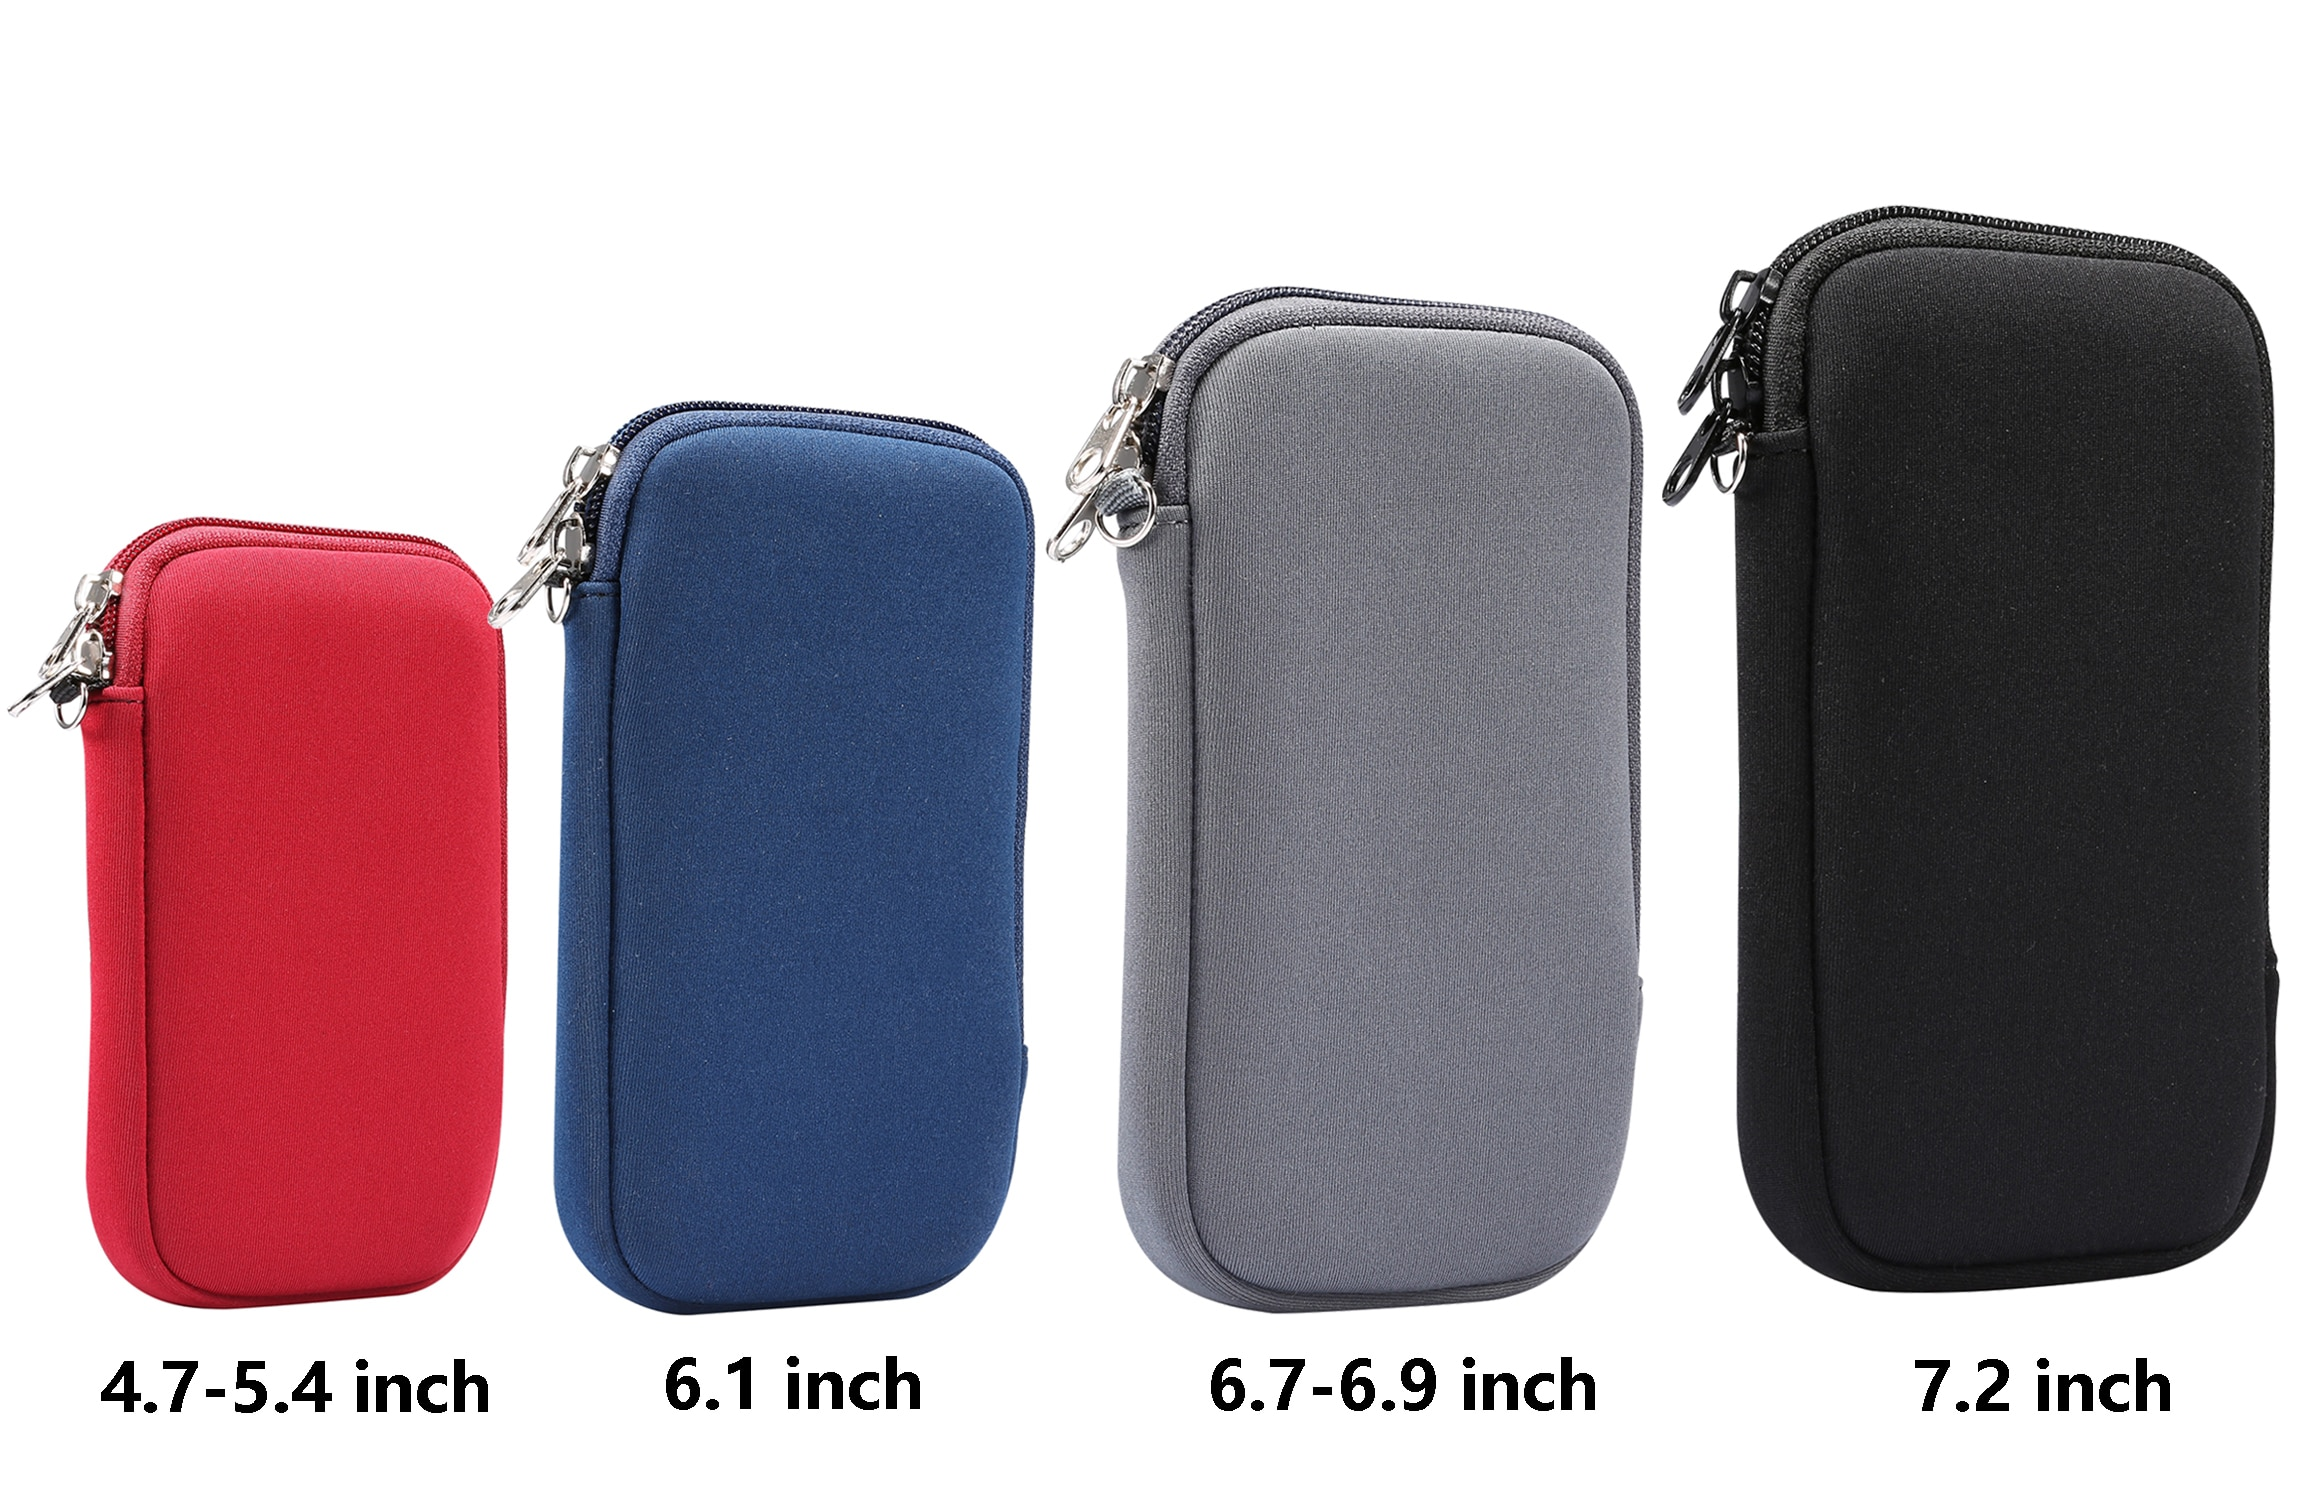 Neoprene bolsa saco luva caso para iphone 12 11 pro max xr xs max 12 mini para nota 20 s20 ultra a71 a51 zíper slot para cartão